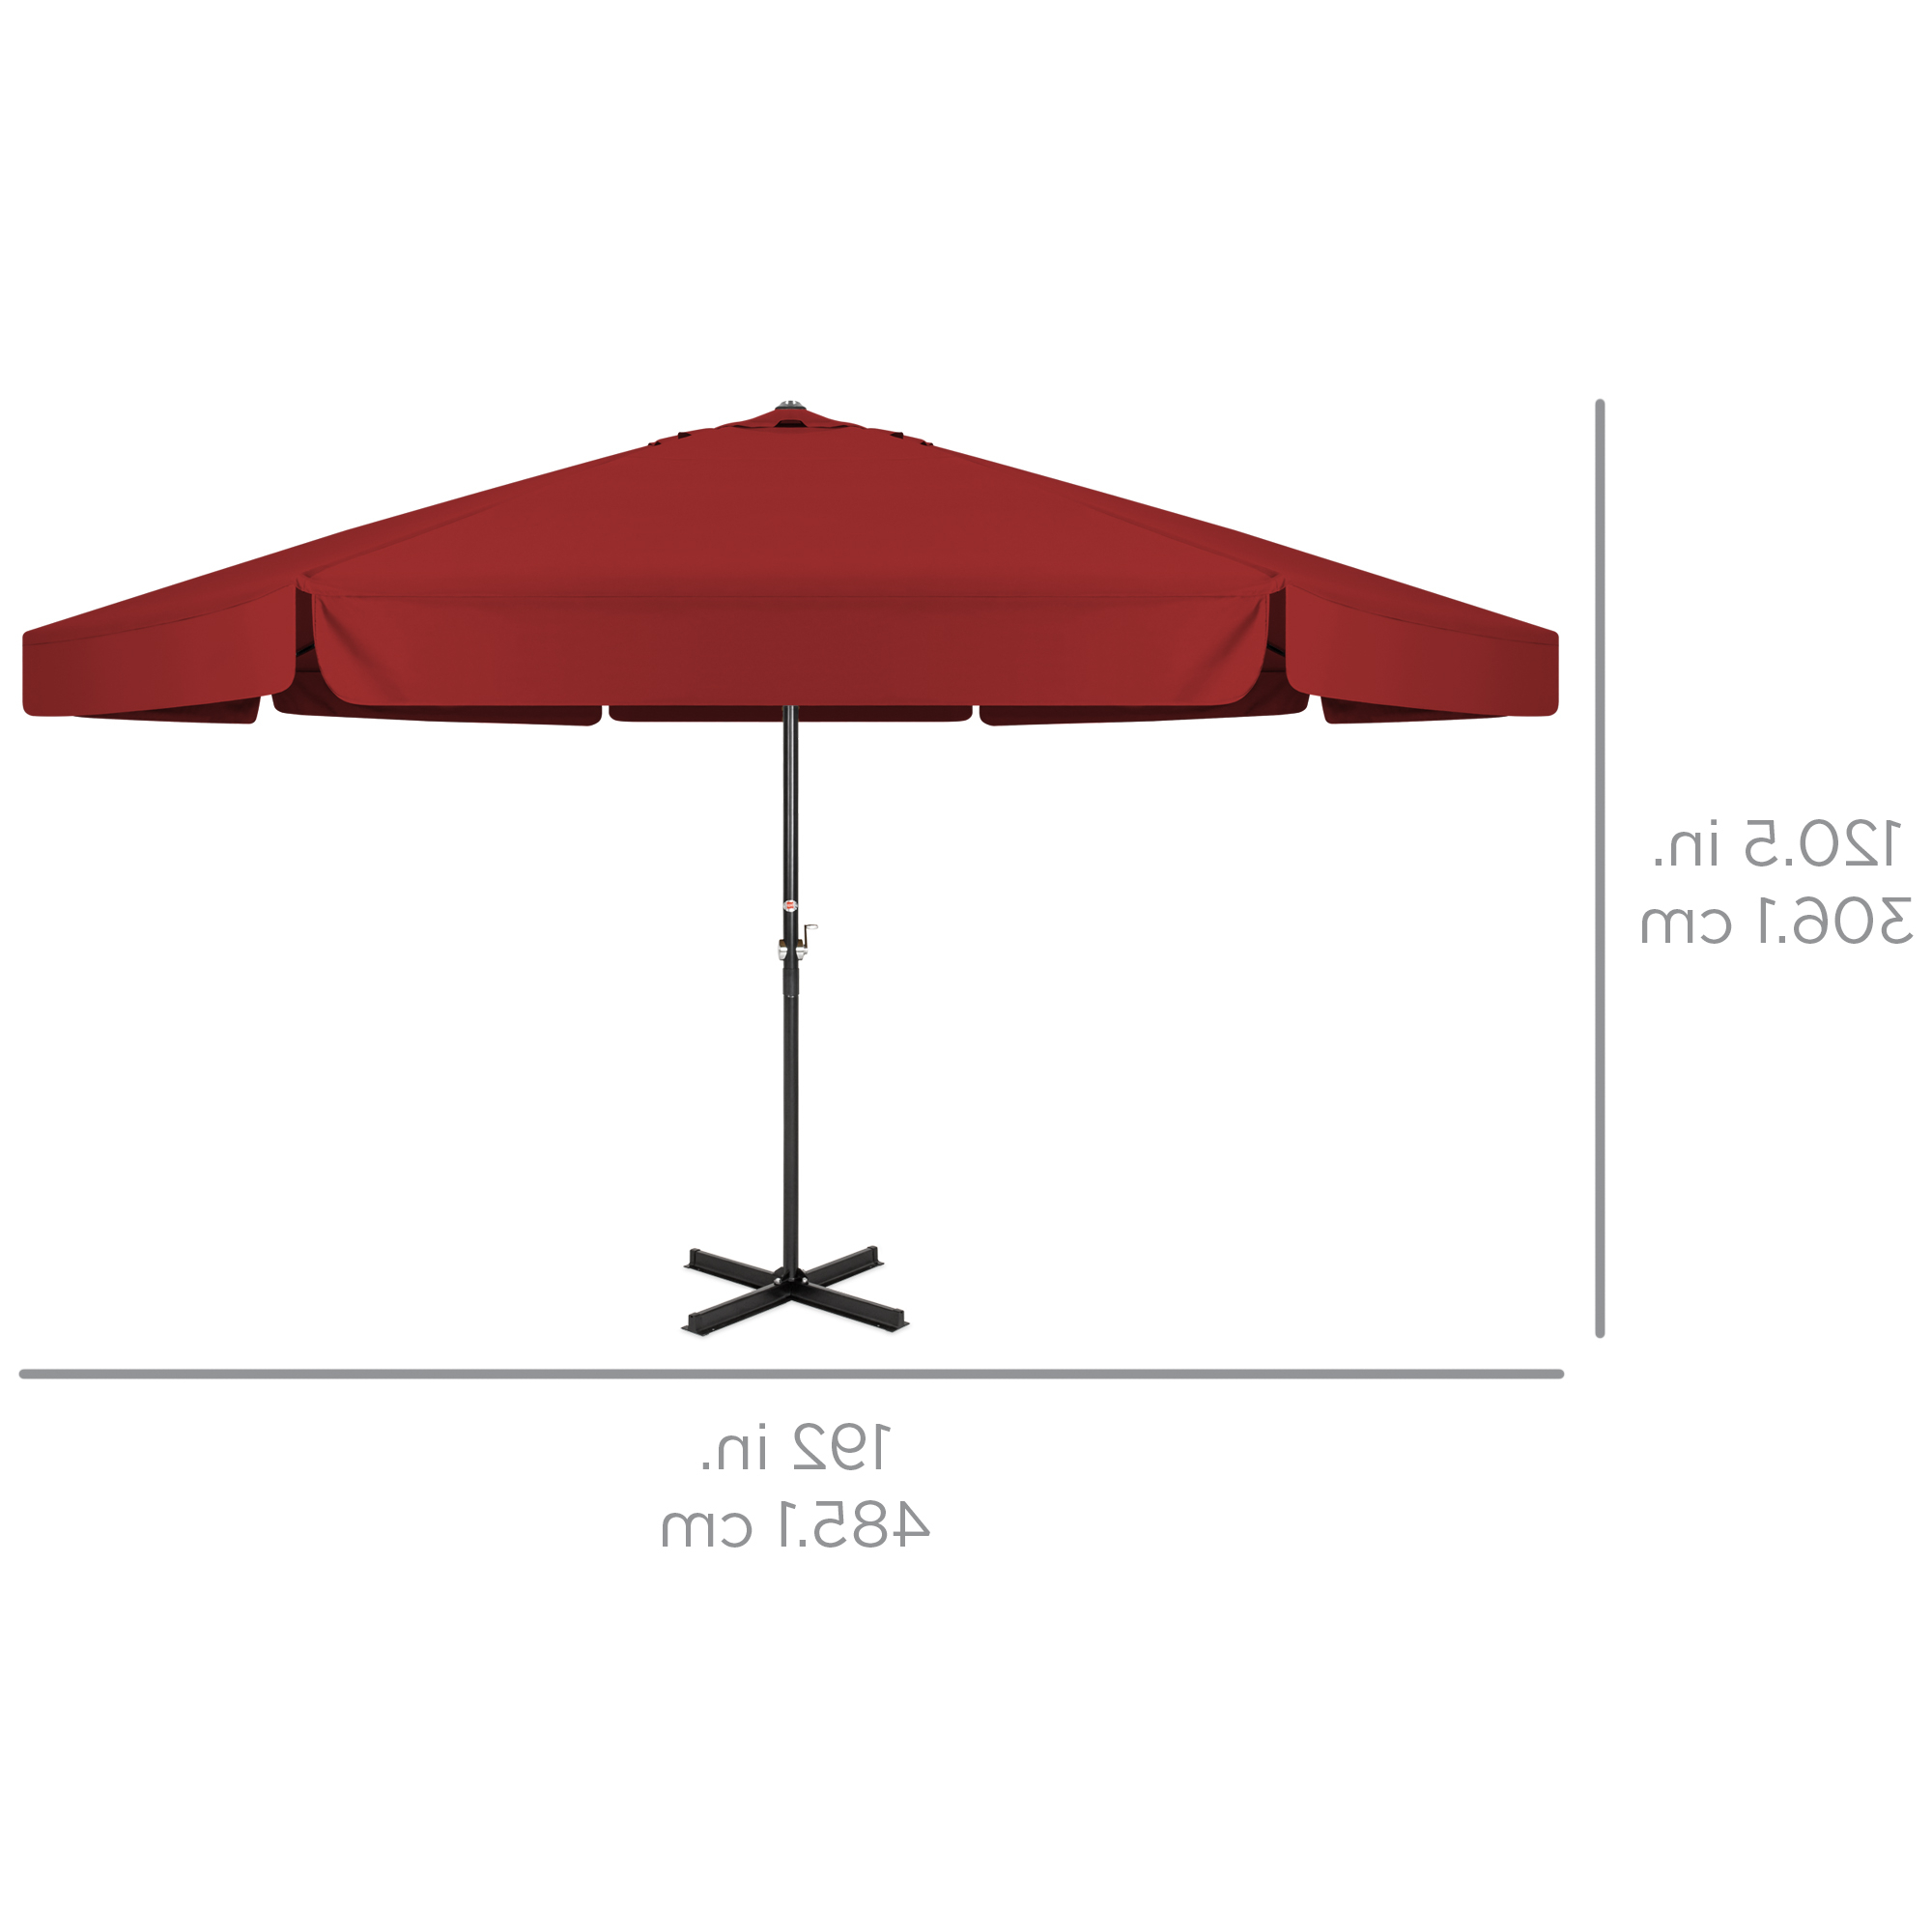 Best Choice Products 16Ft Outdoor Patio Drape Canopy Market Umbrella W/  Cross Base, Crank, Air Vent – Burgundy Regarding Well Known Drape Umbrellas (View 5 of 20)